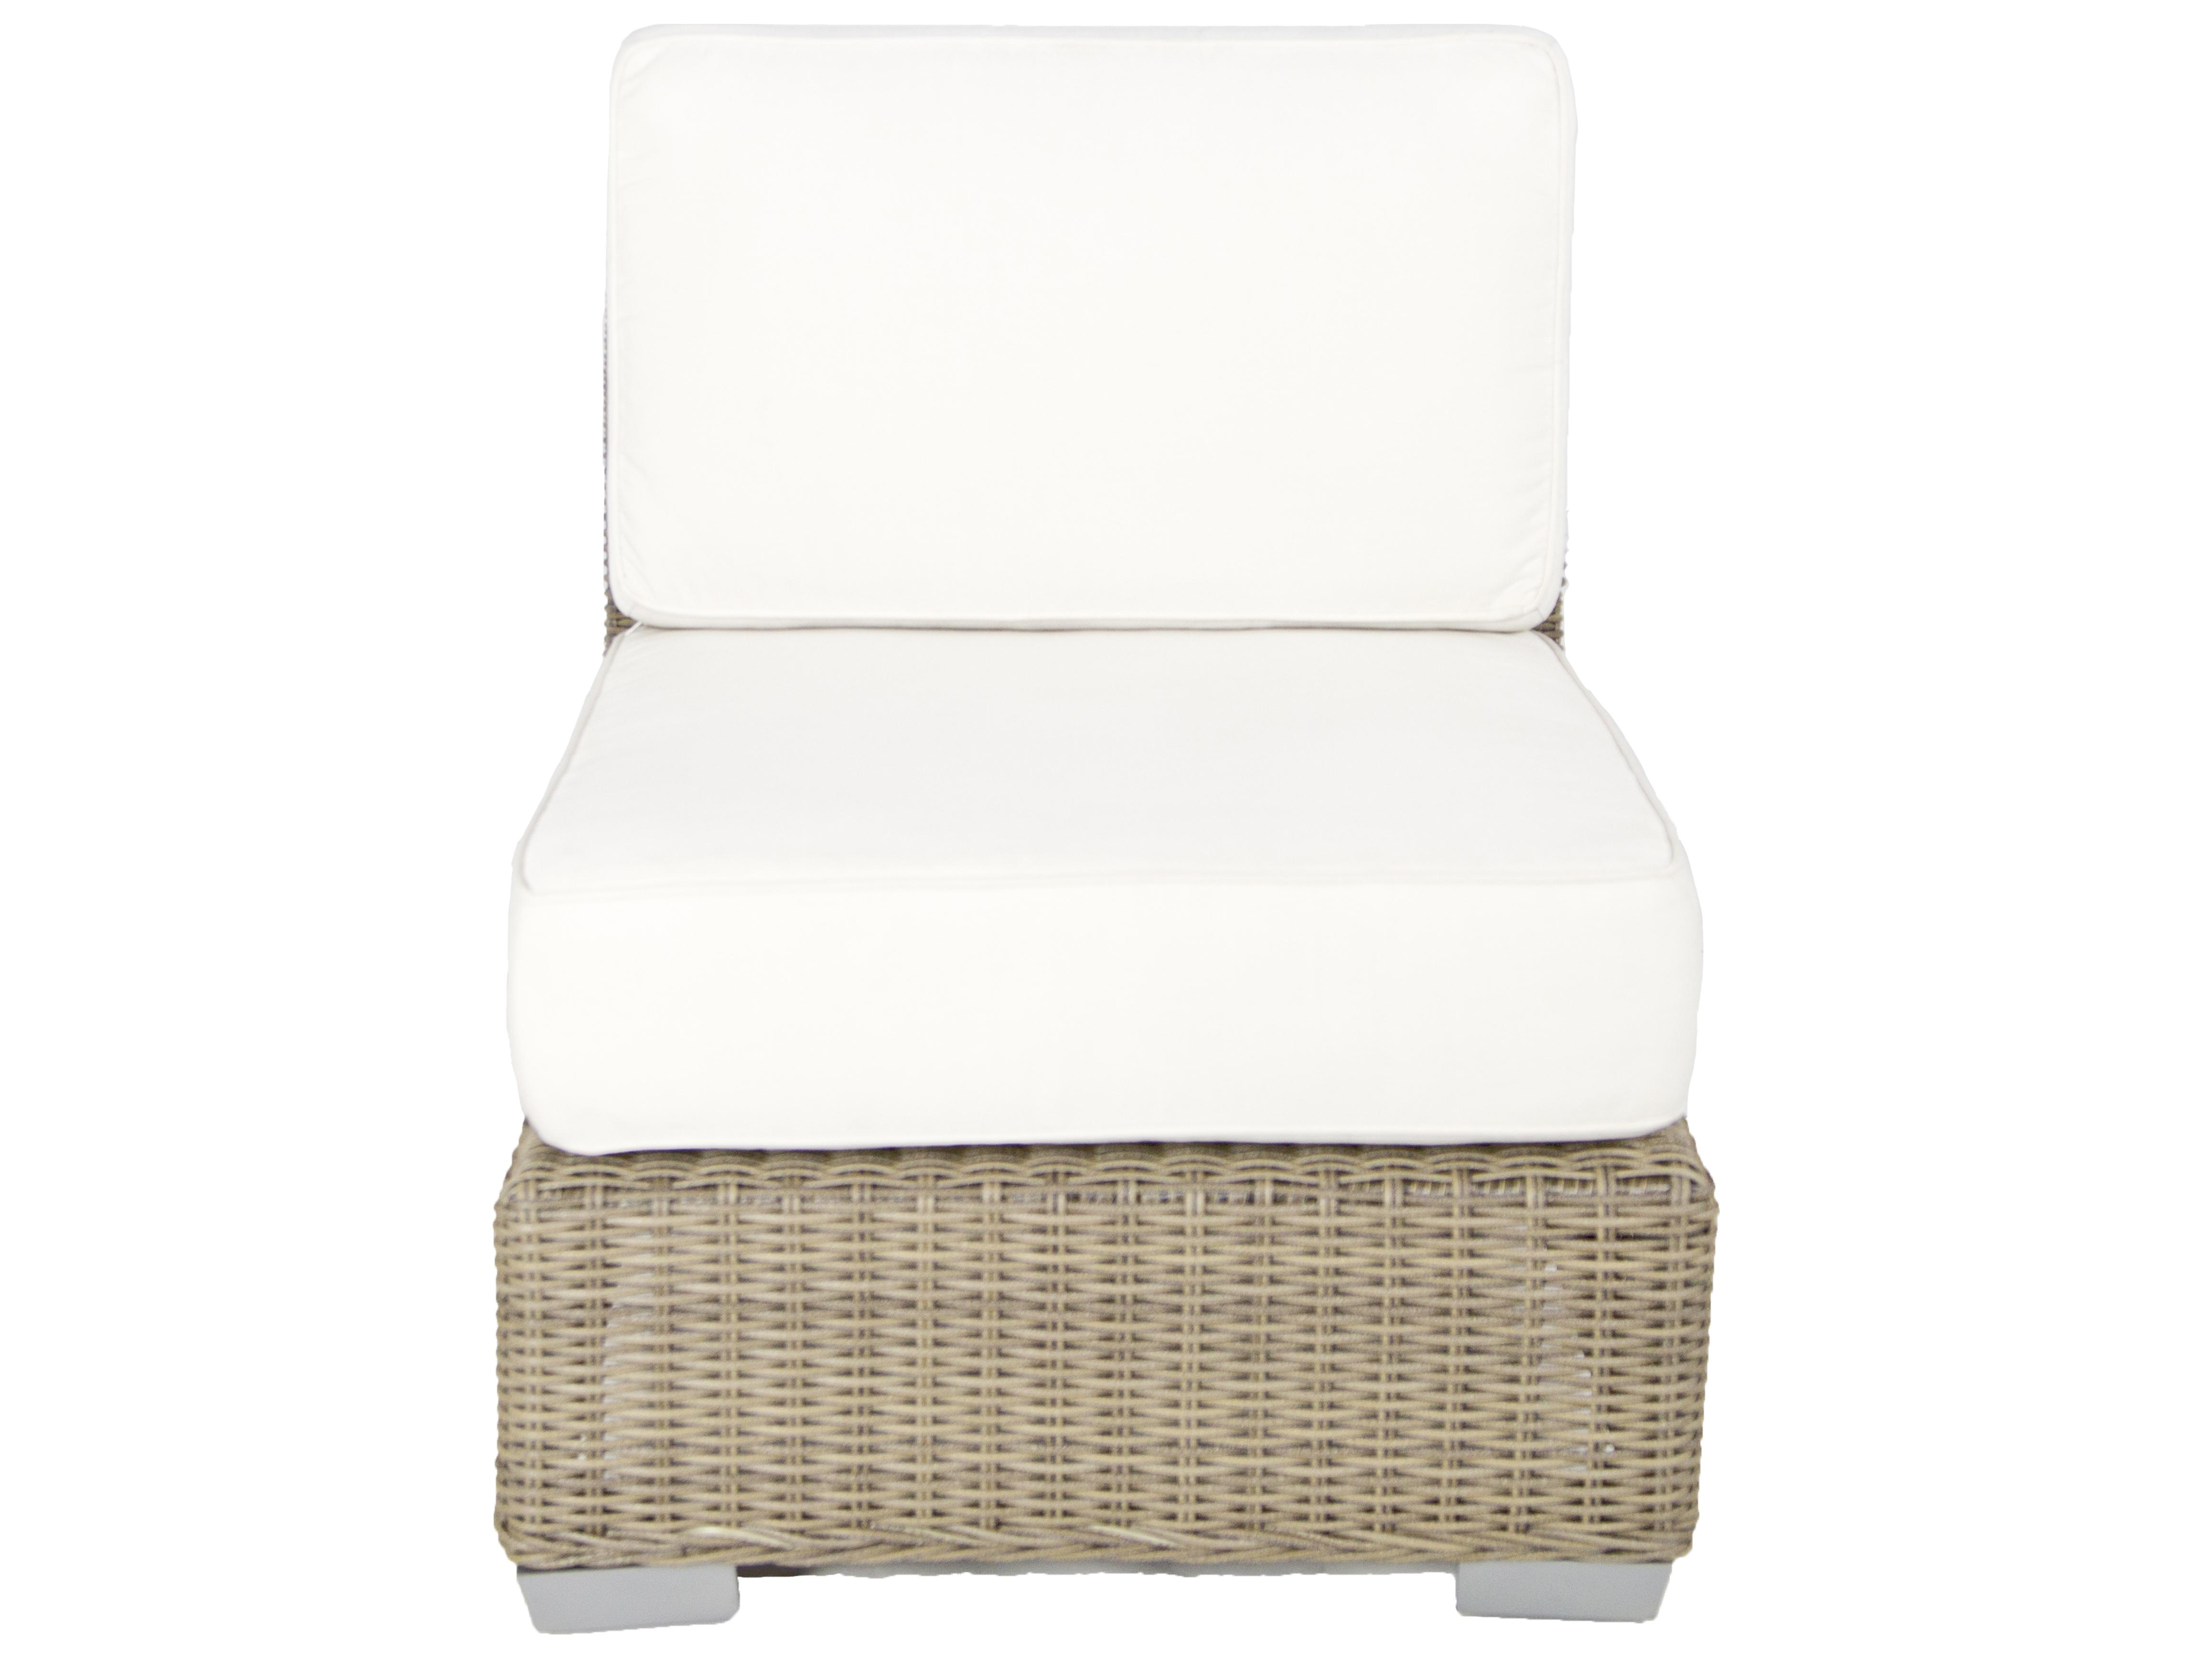 Patio Heaven Palisades Armless Lounge Chair